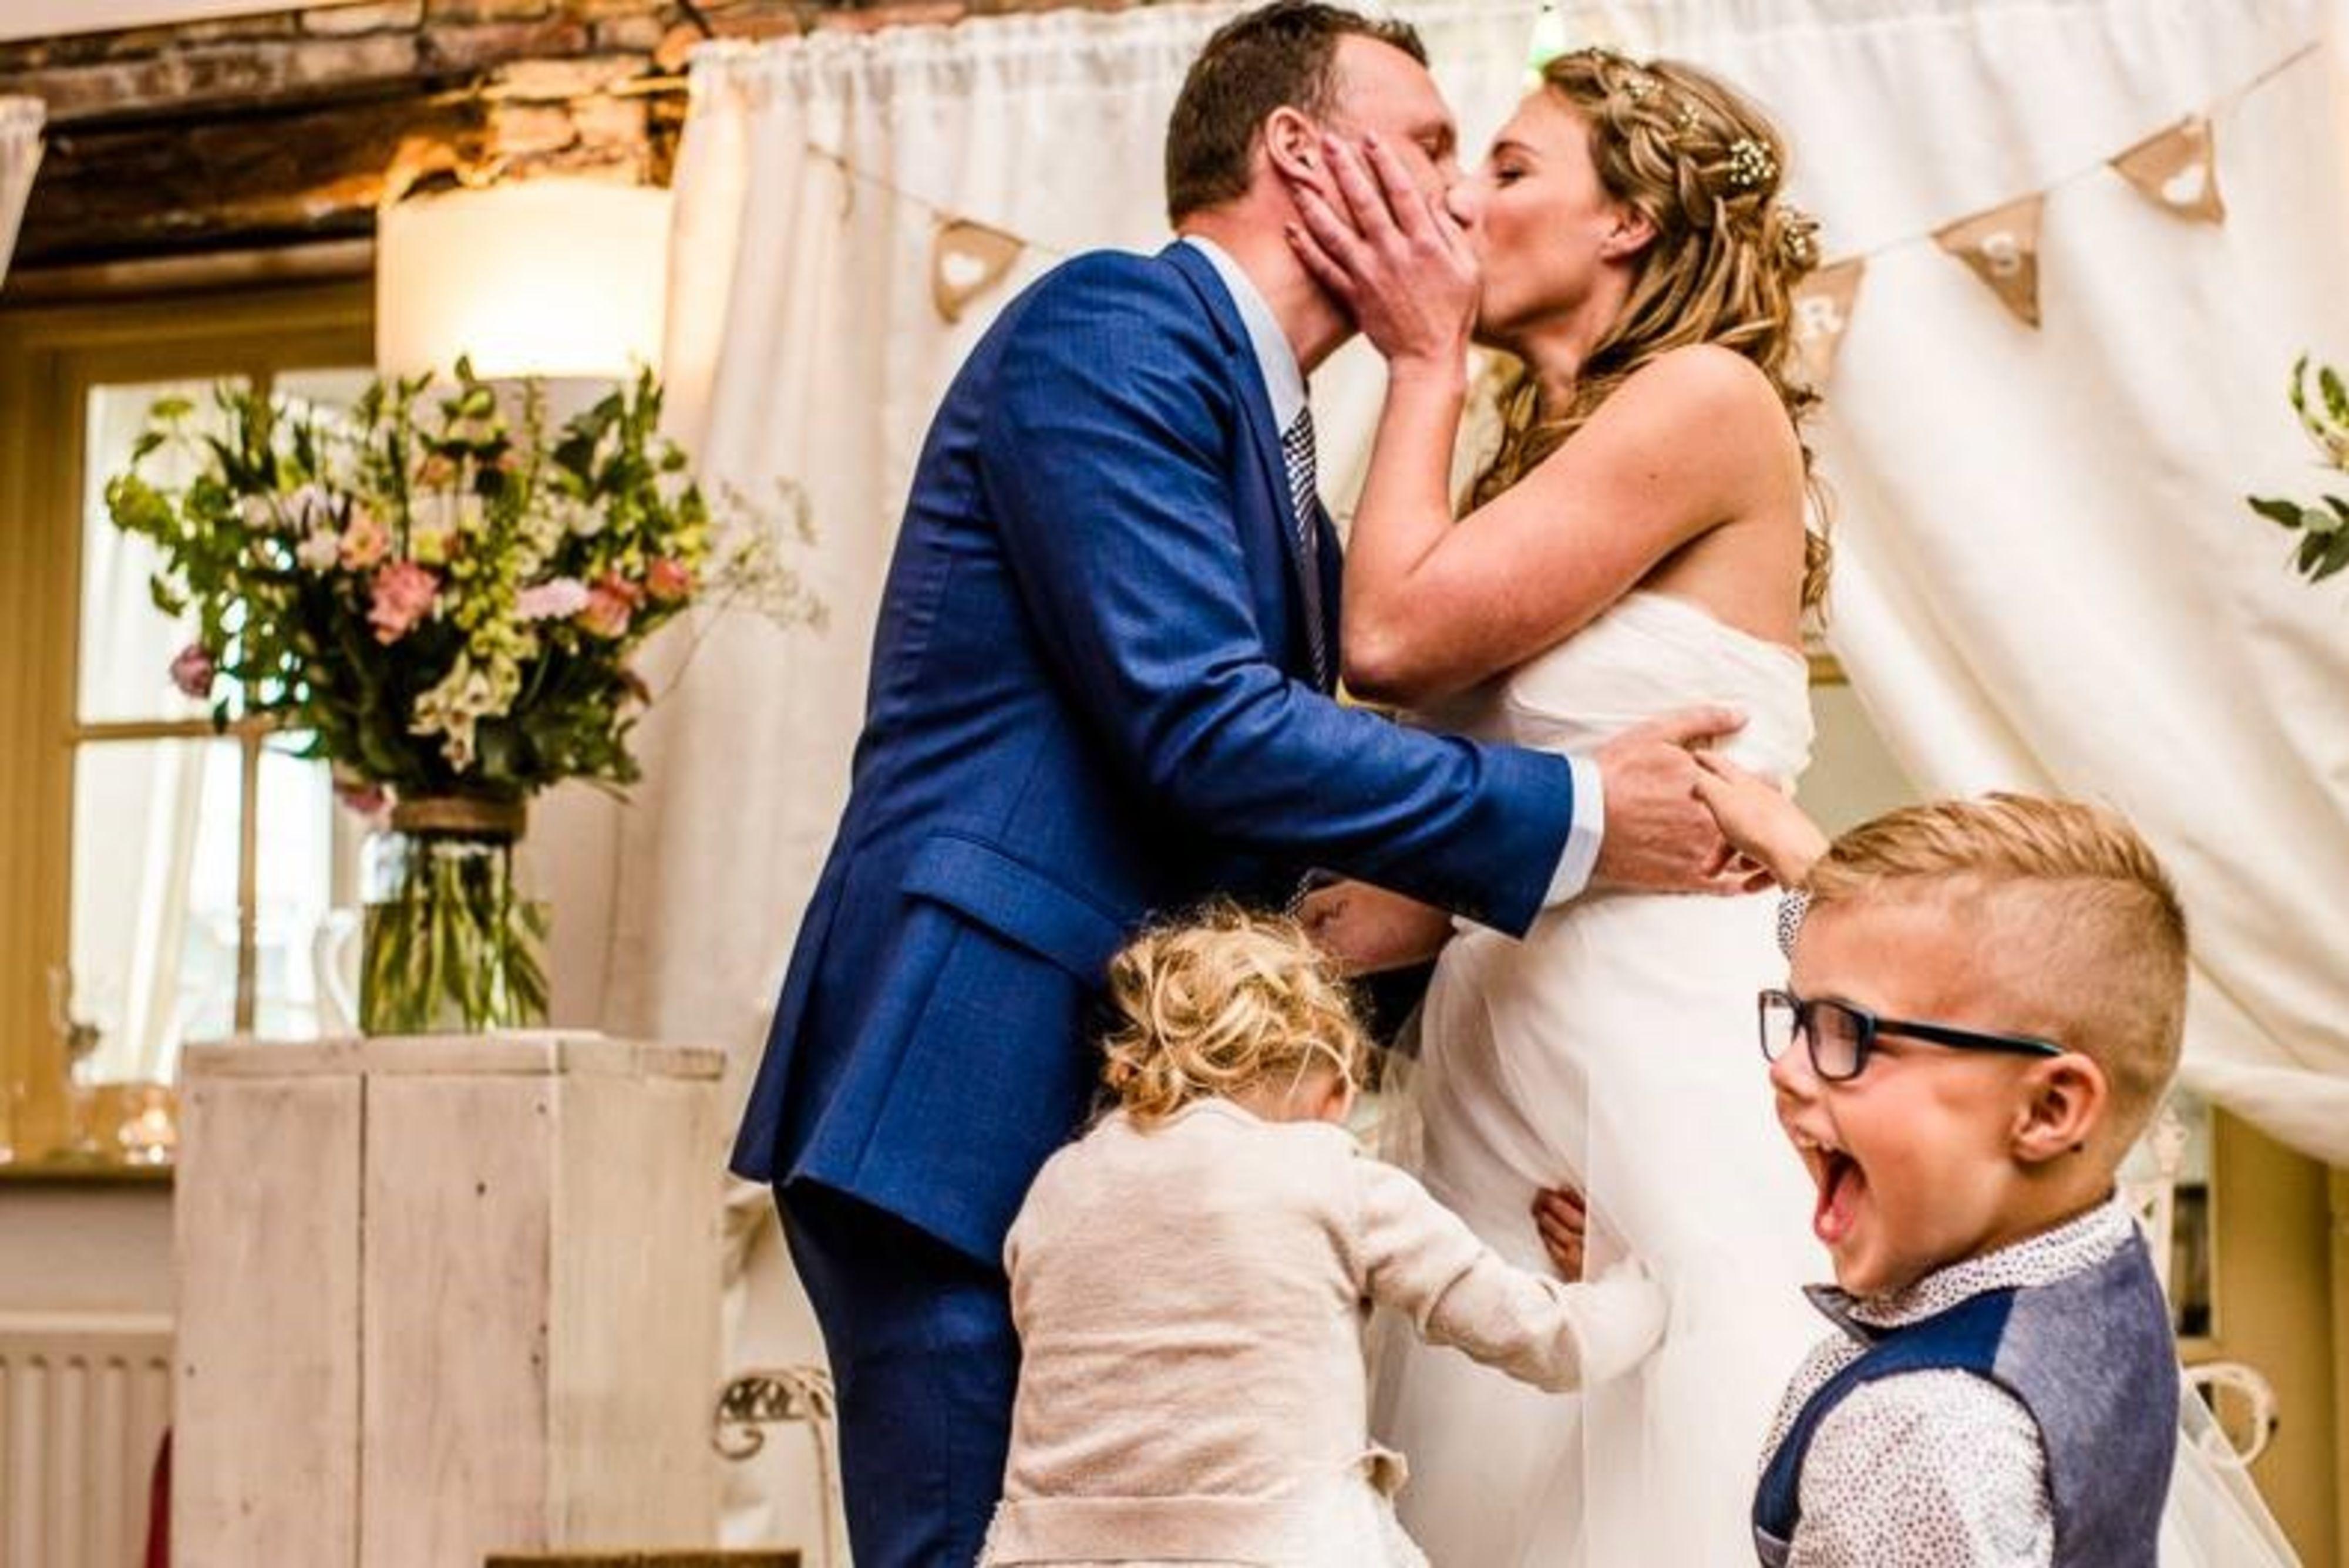 Hoeve Klein Zundert Huwelijk